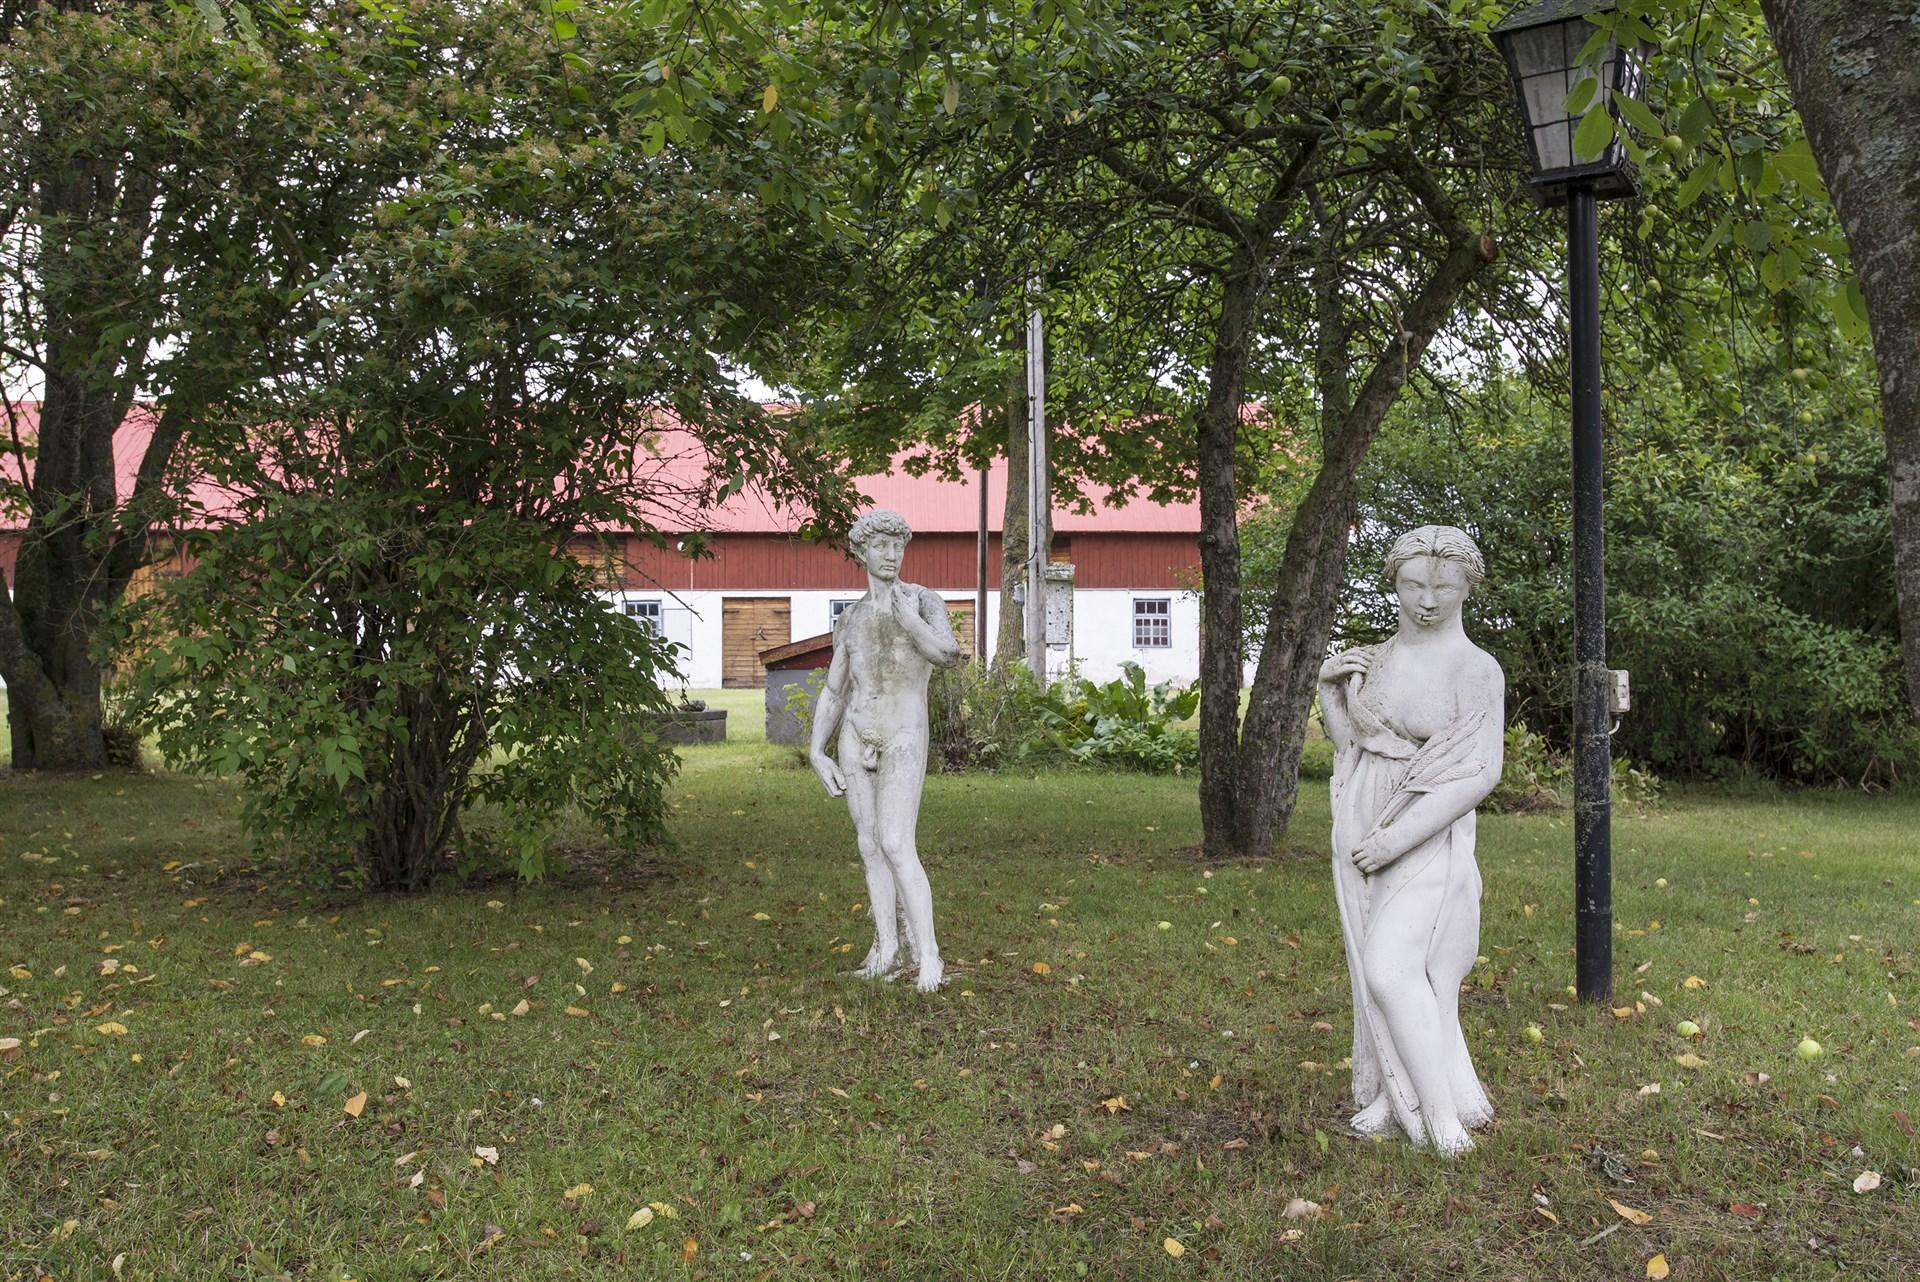 Statyer i trdgården